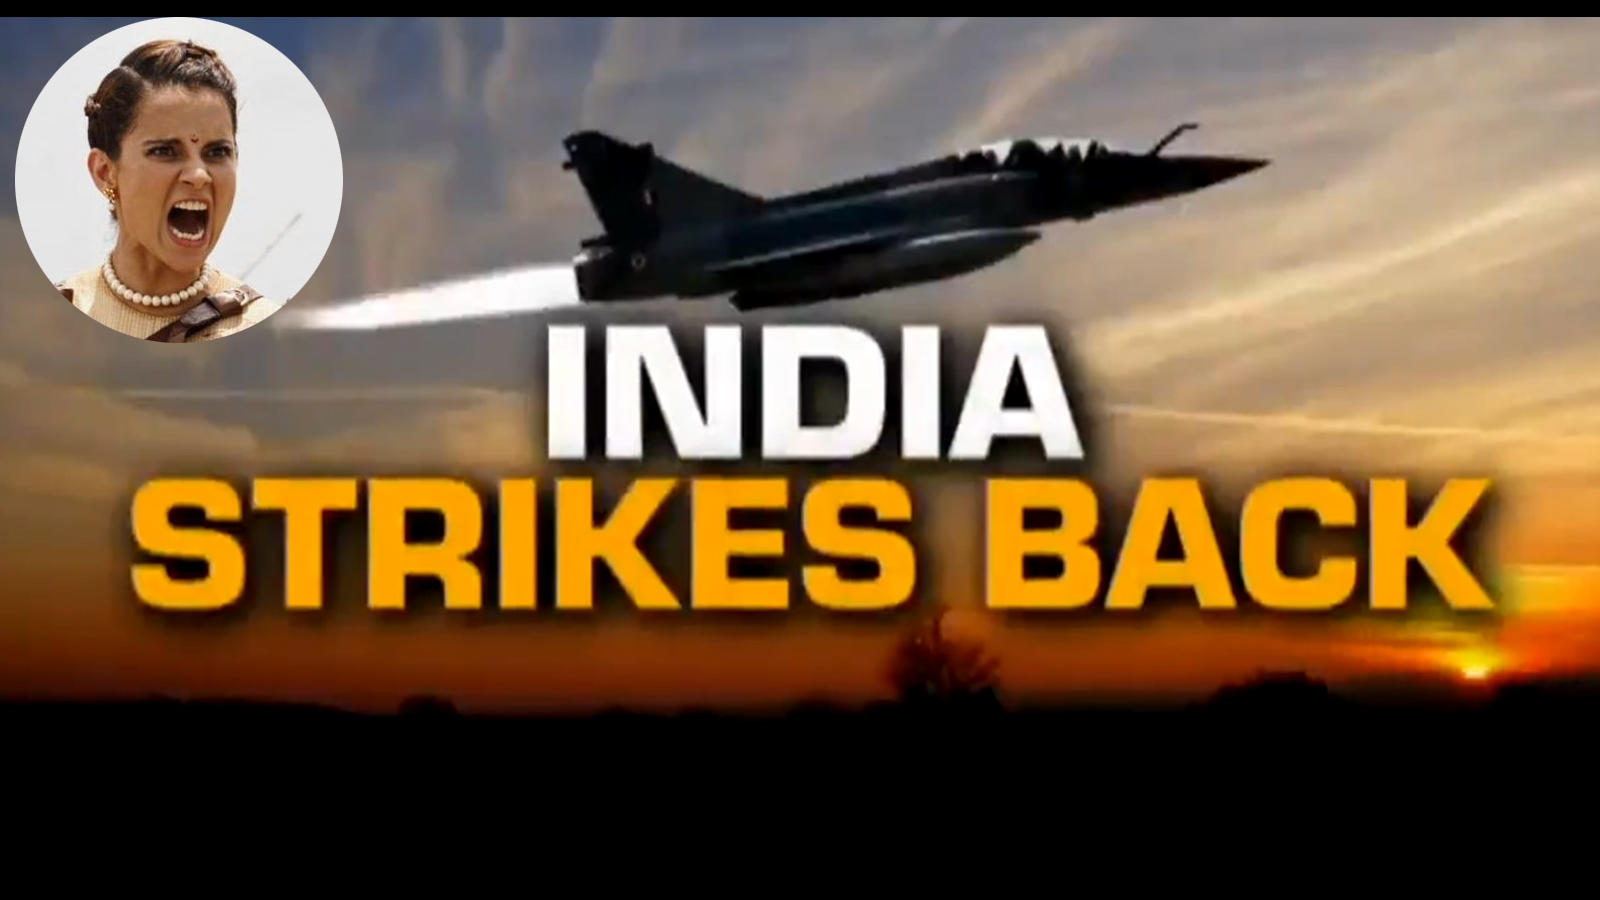 Air strikes in Pakistan: Kangana Ranaut lauds IAF for striking back like true heroes